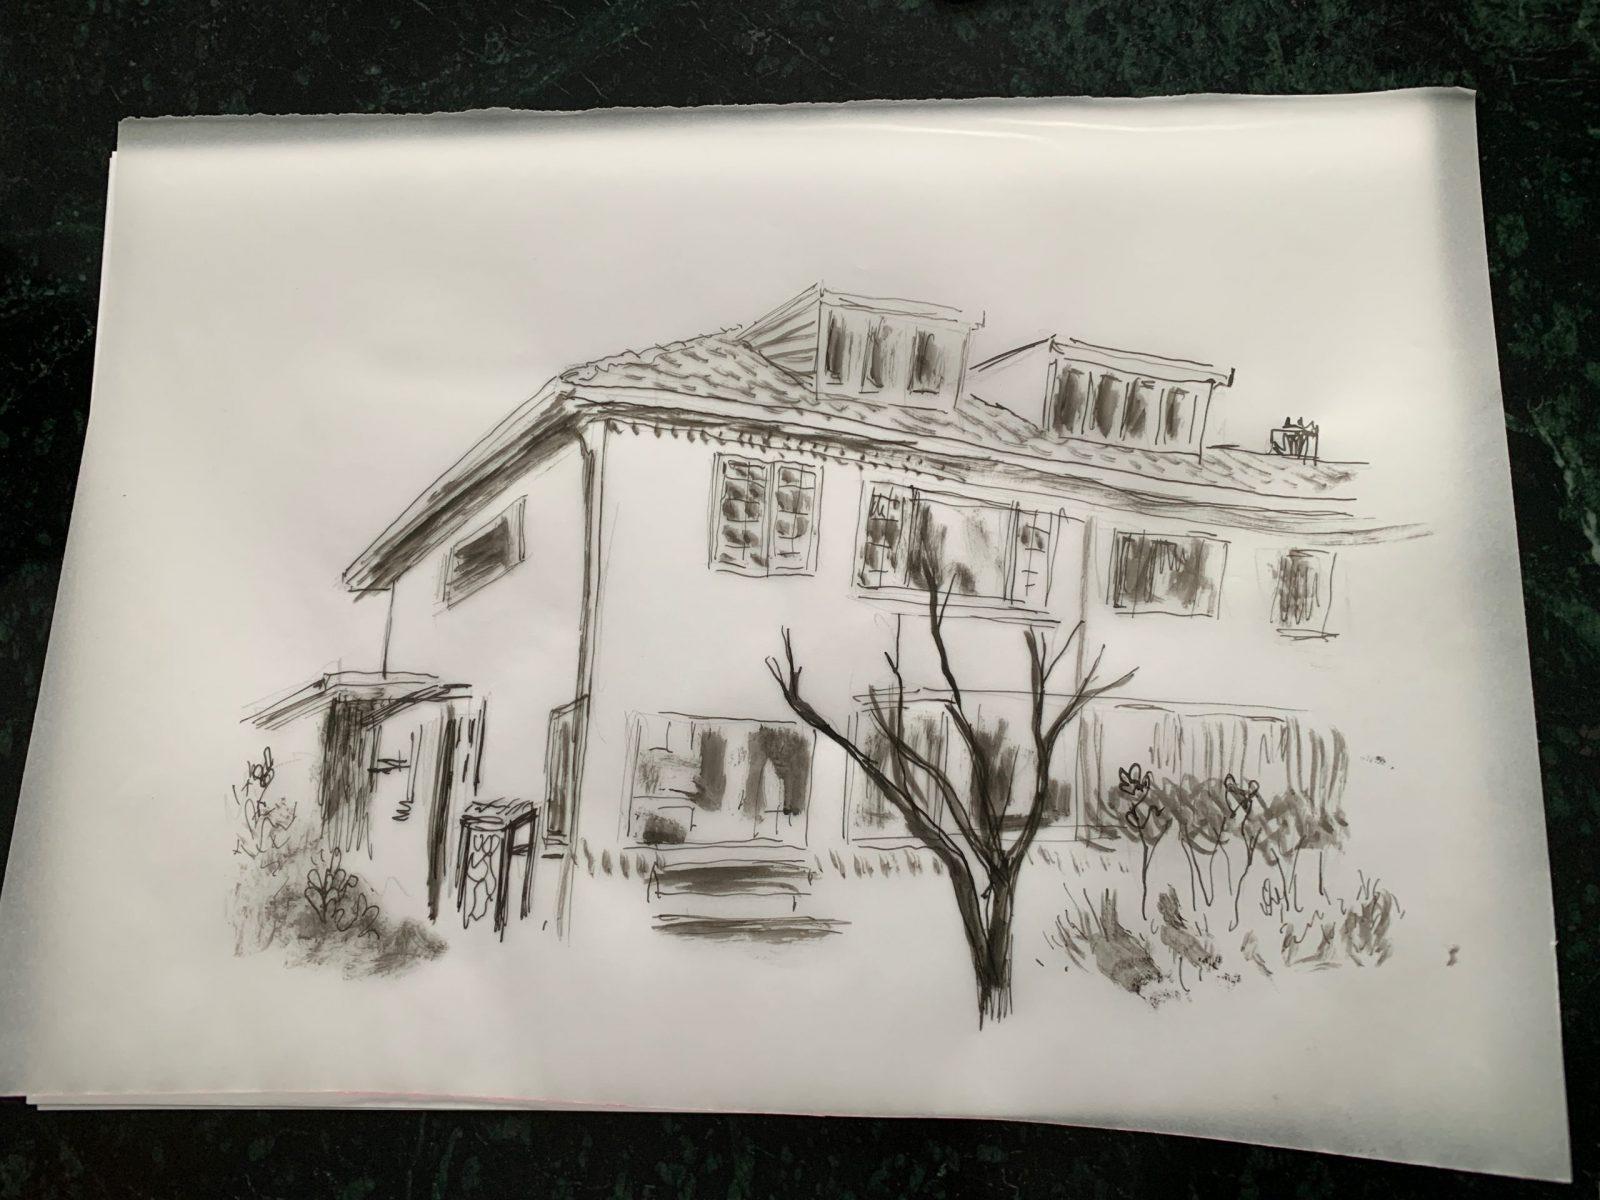 Sketch of childhood home in Amersfoort, Gilad Seliktar